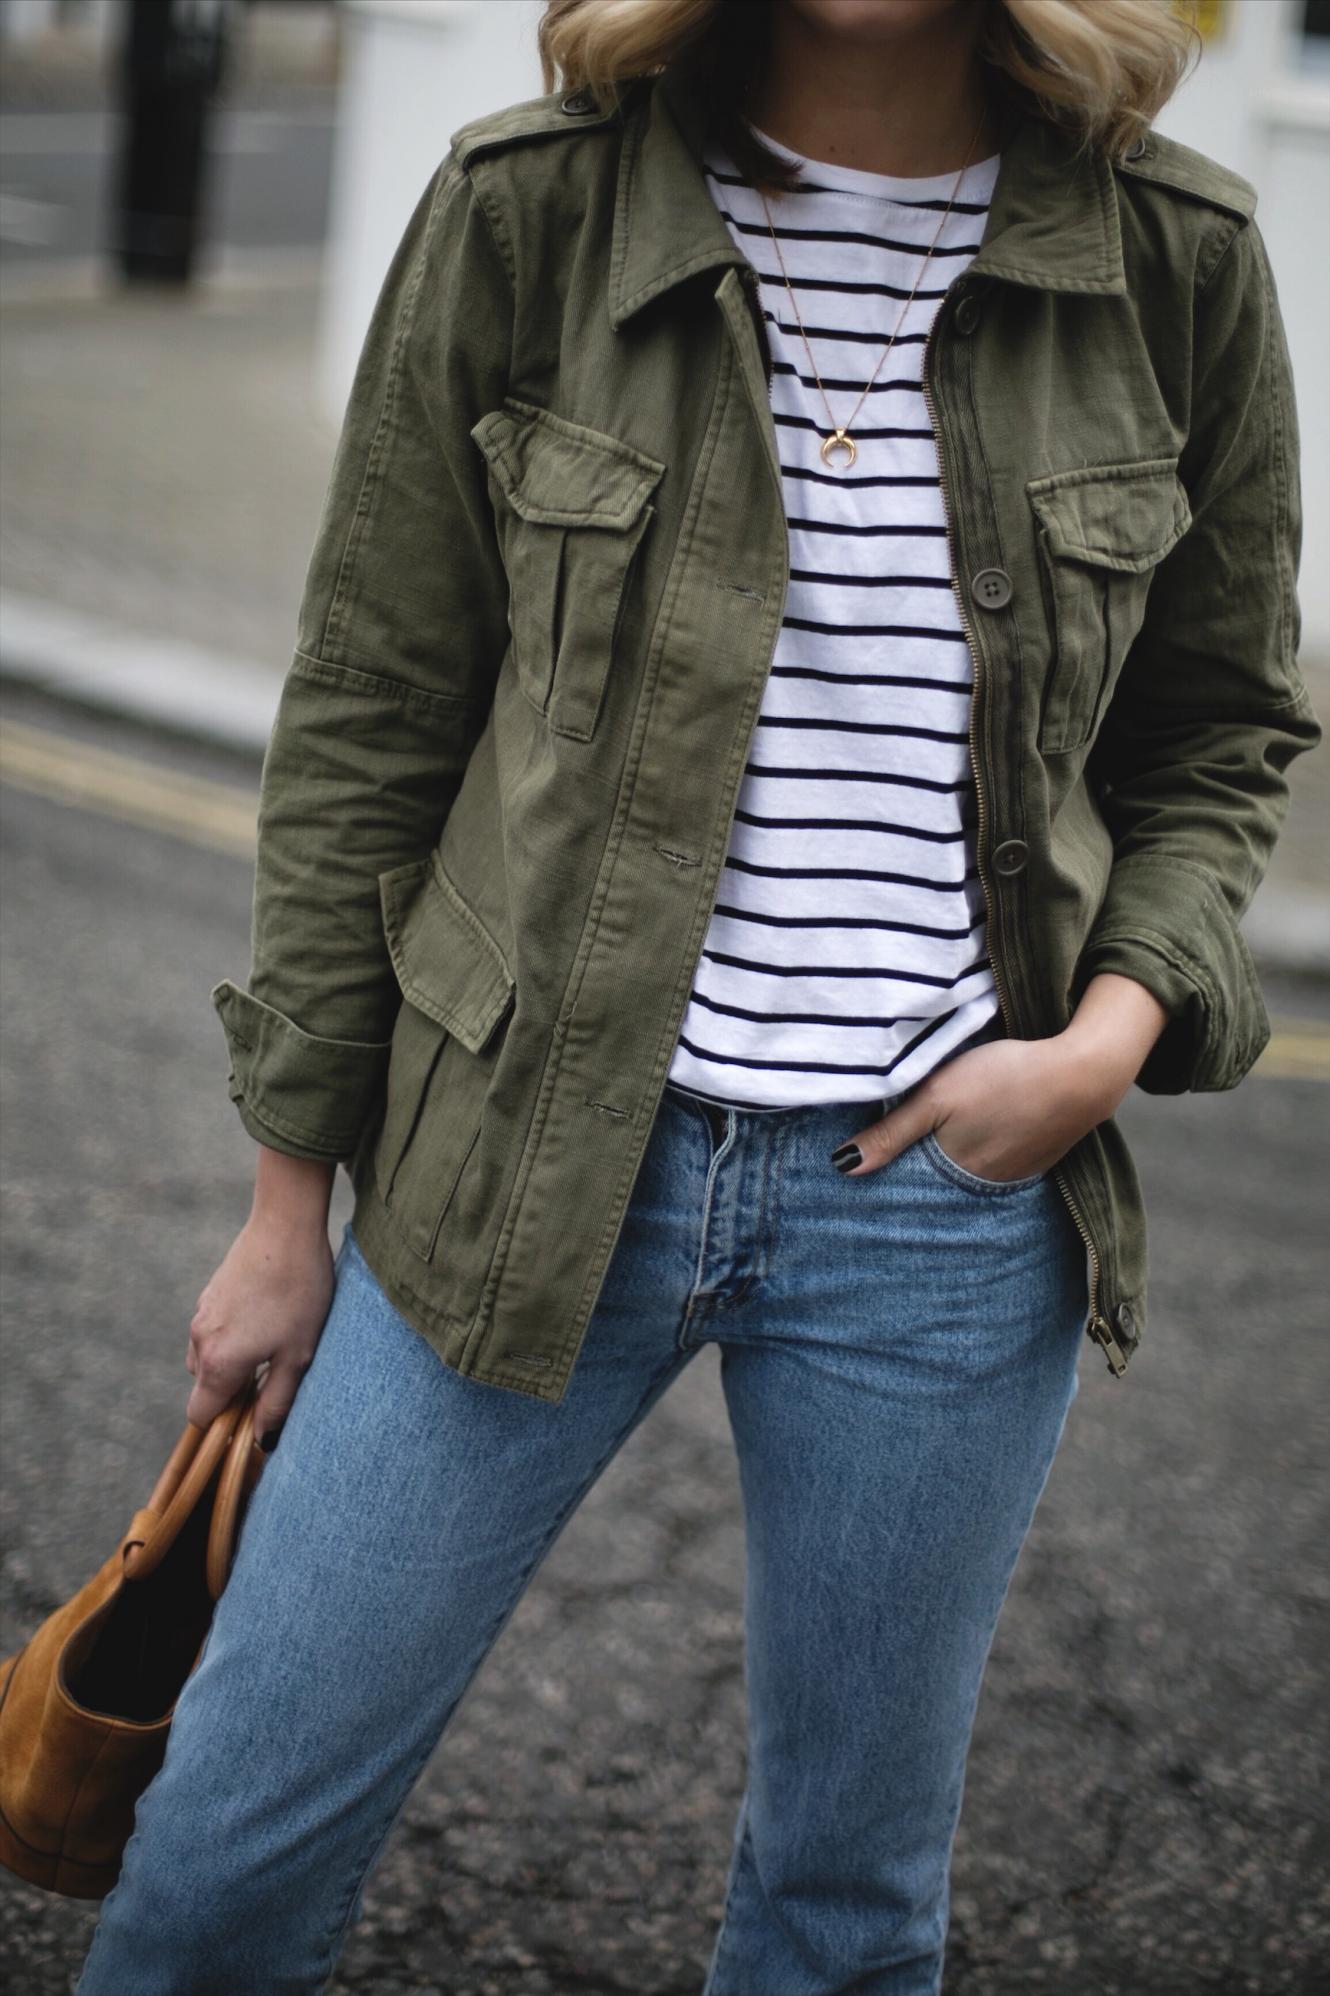 Simon Miller tan nubuck suede Bonsai bag with ring handle, khaki utility army jacket, stripe t-shirt, denim, wedge espadrilles